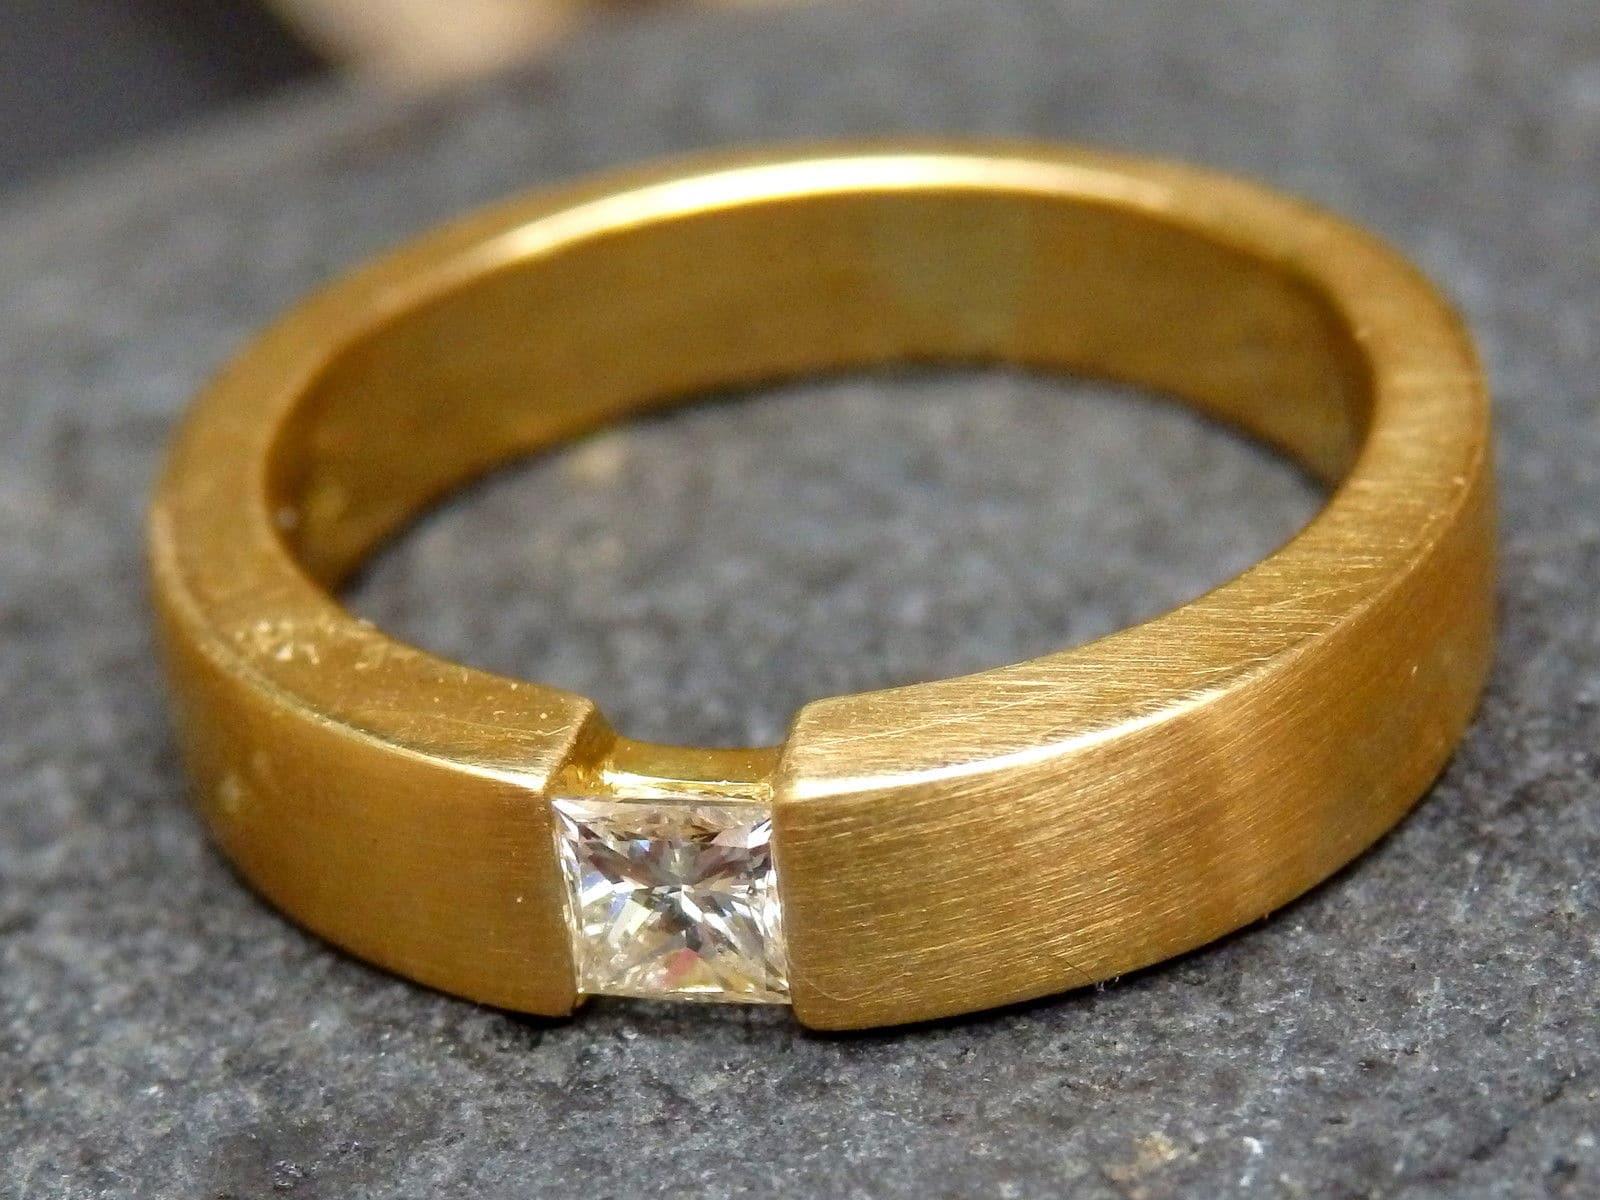 isady aleida gold damen ring 18 karat 750 gelbgold platiert. Black Bedroom Furniture Sets. Home Design Ideas